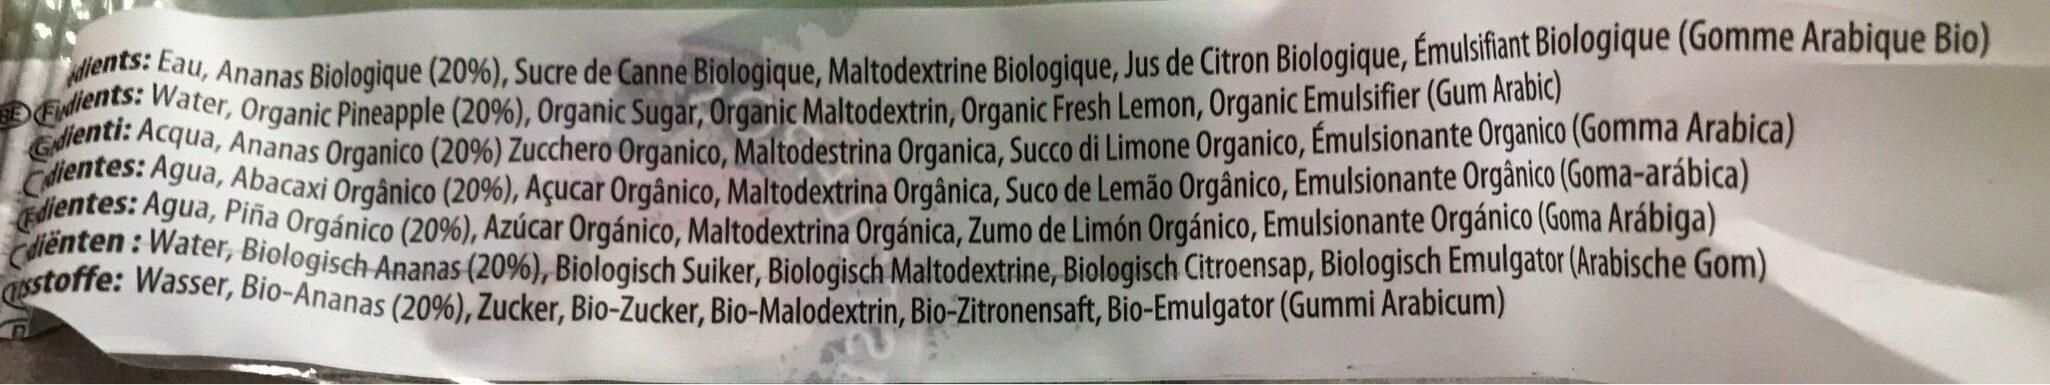 Glace Ananas Bio - Ingrédients - fr